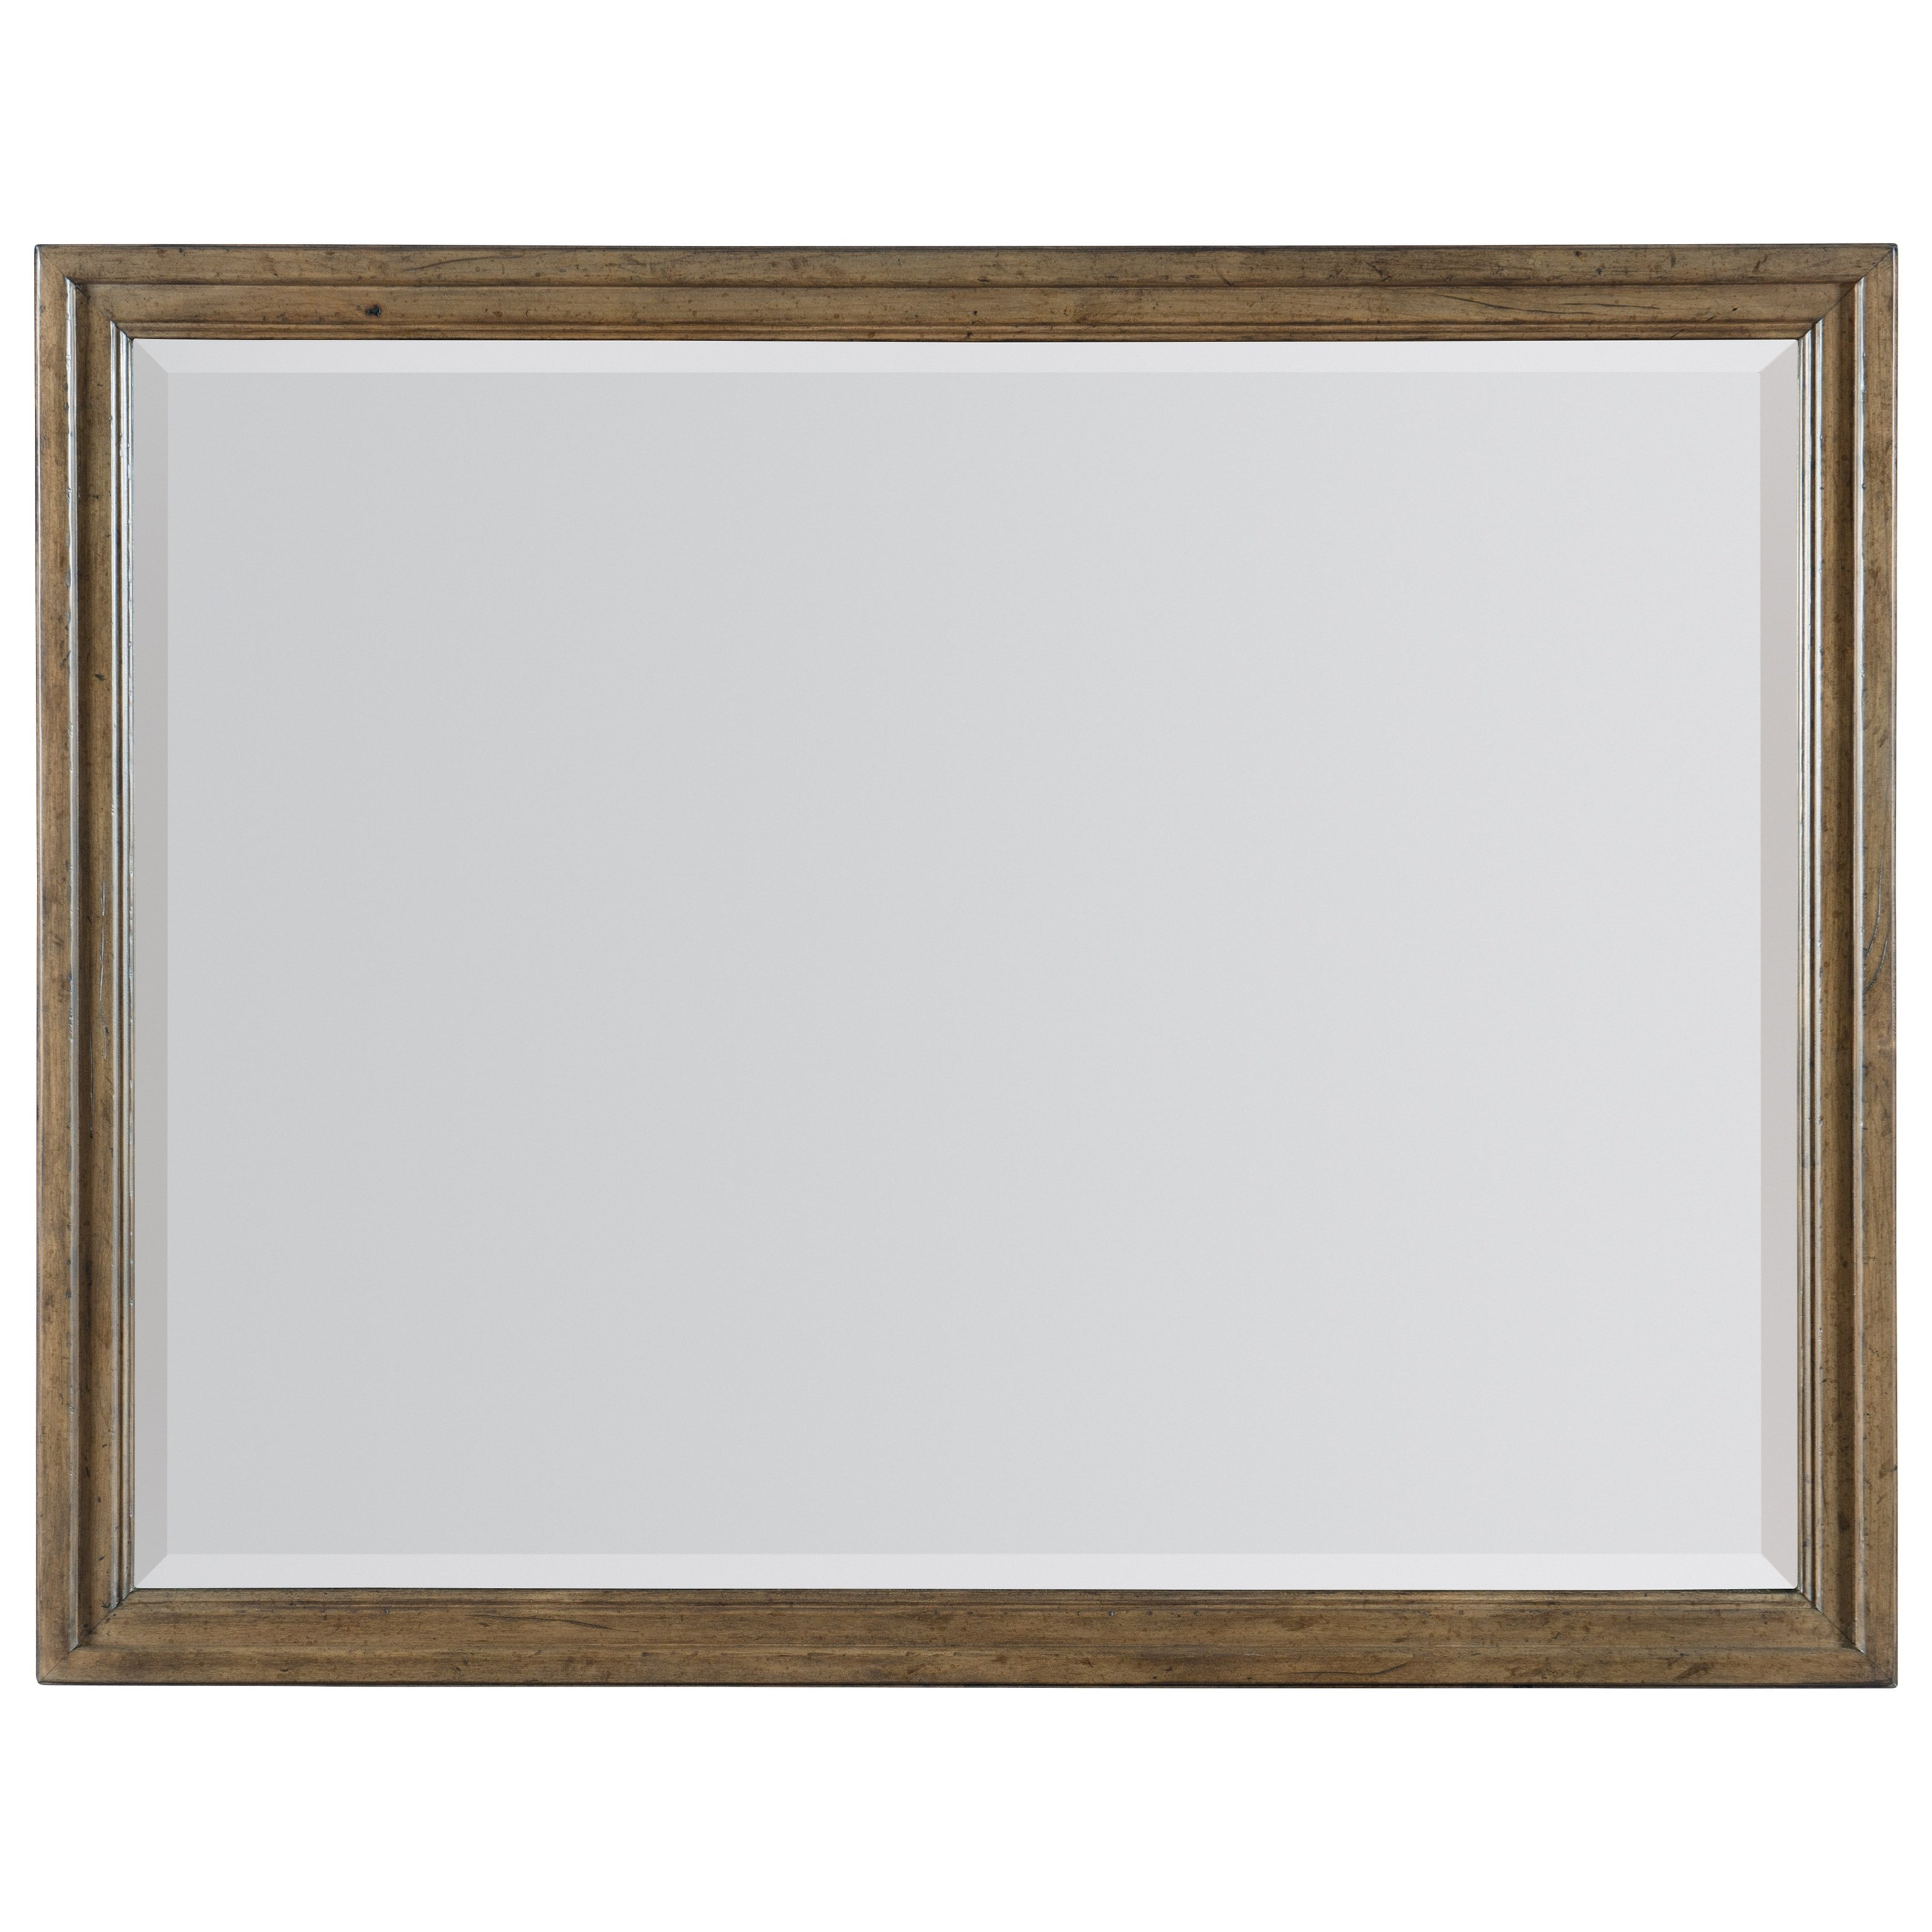 Montebello Mirror by Hooker Furniture at Goods Furniture